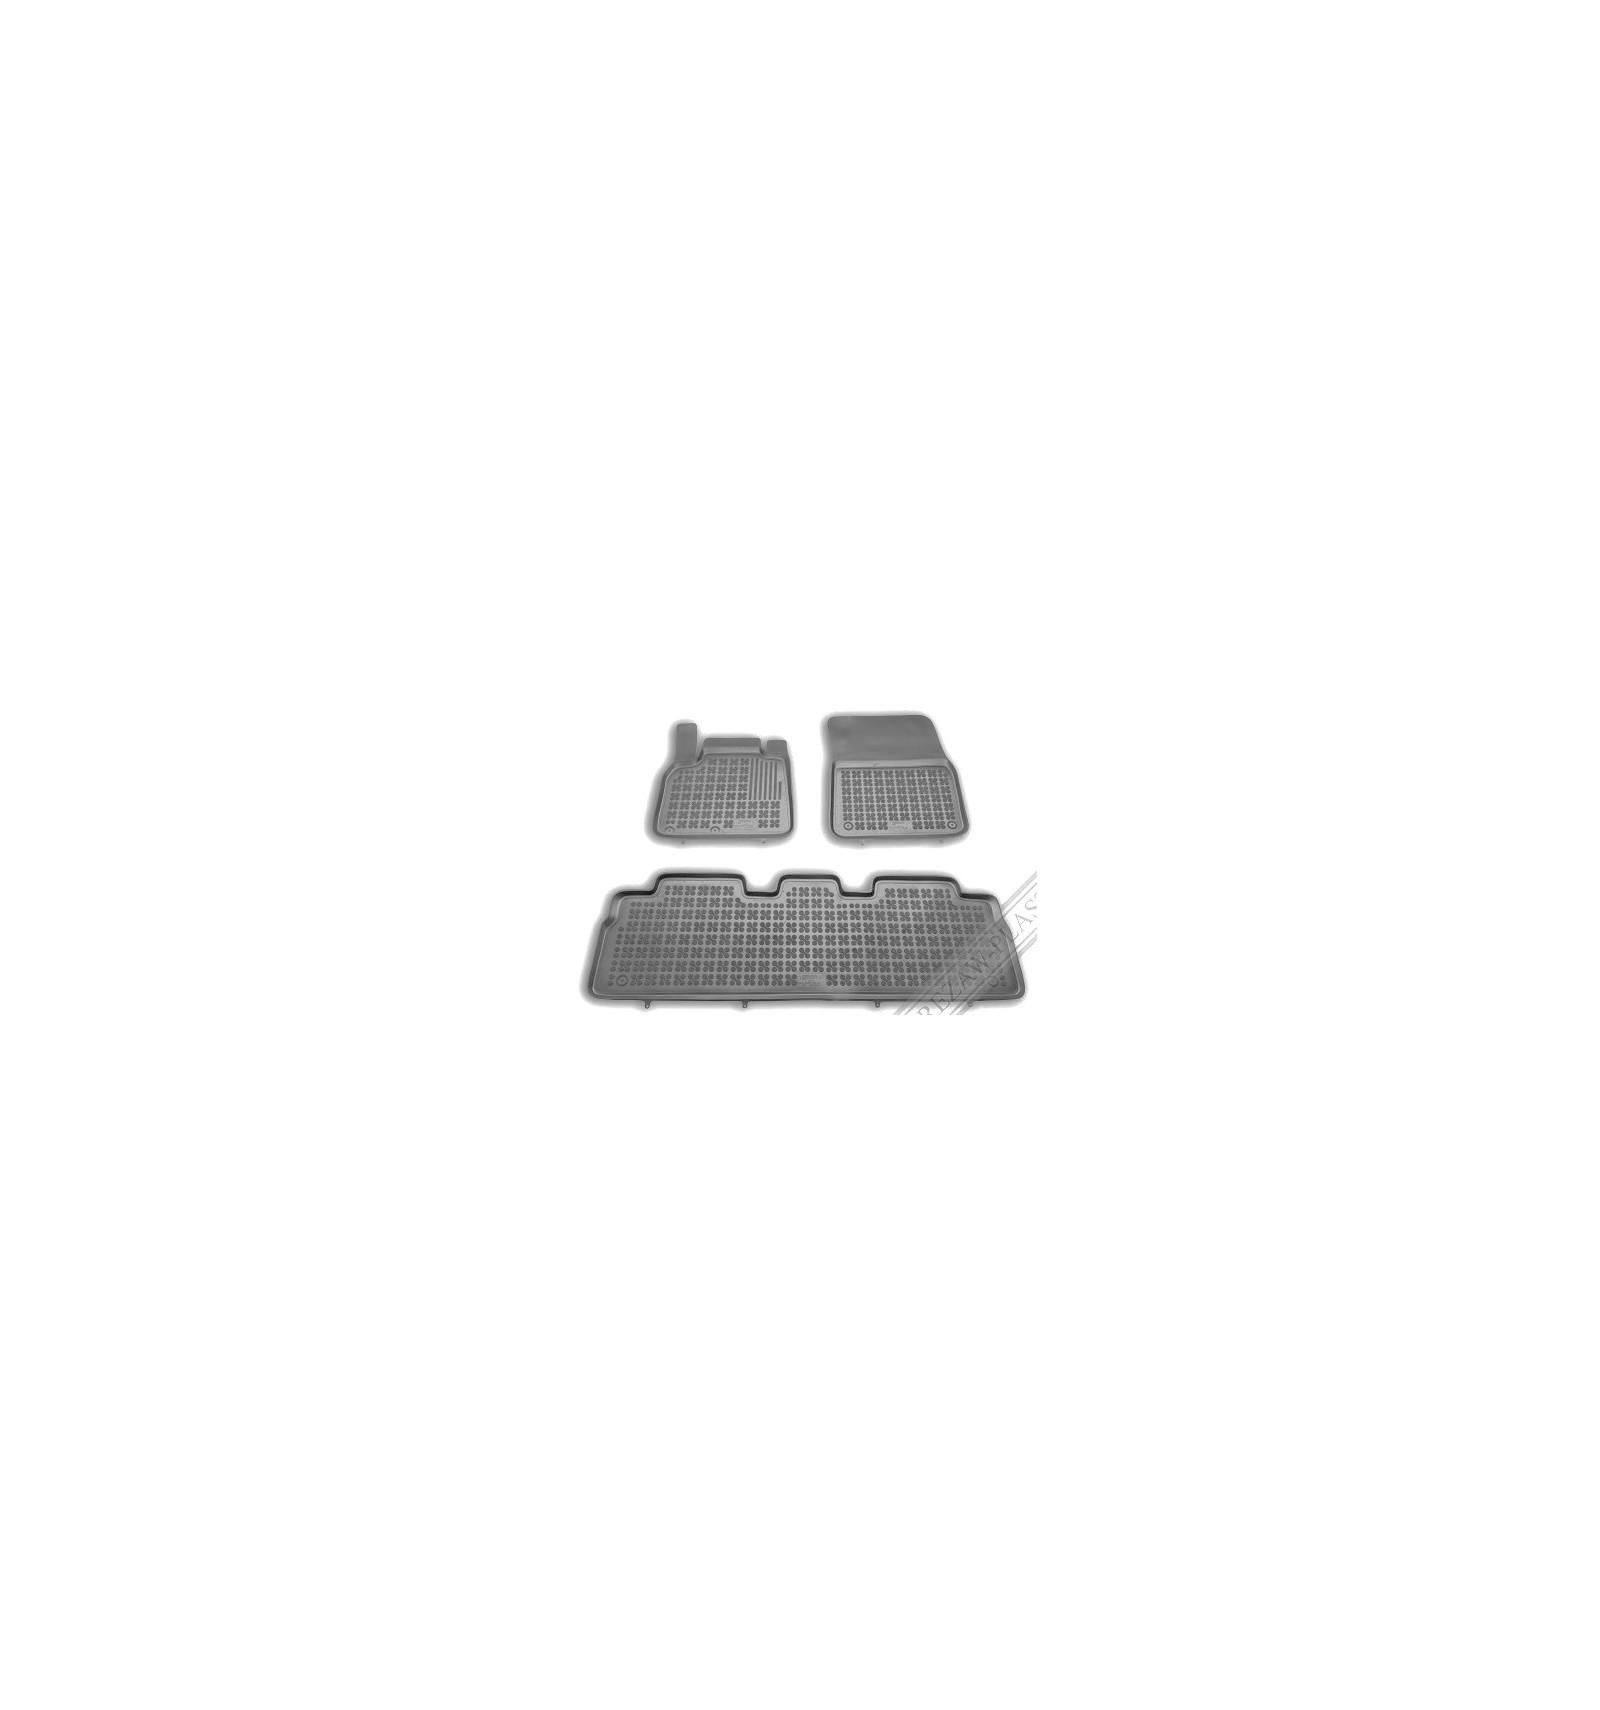 renault tapis de sol renault espace 4 jeu de tapis protection de sol renault espace iv jeu. Black Bedroom Furniture Sets. Home Design Ideas